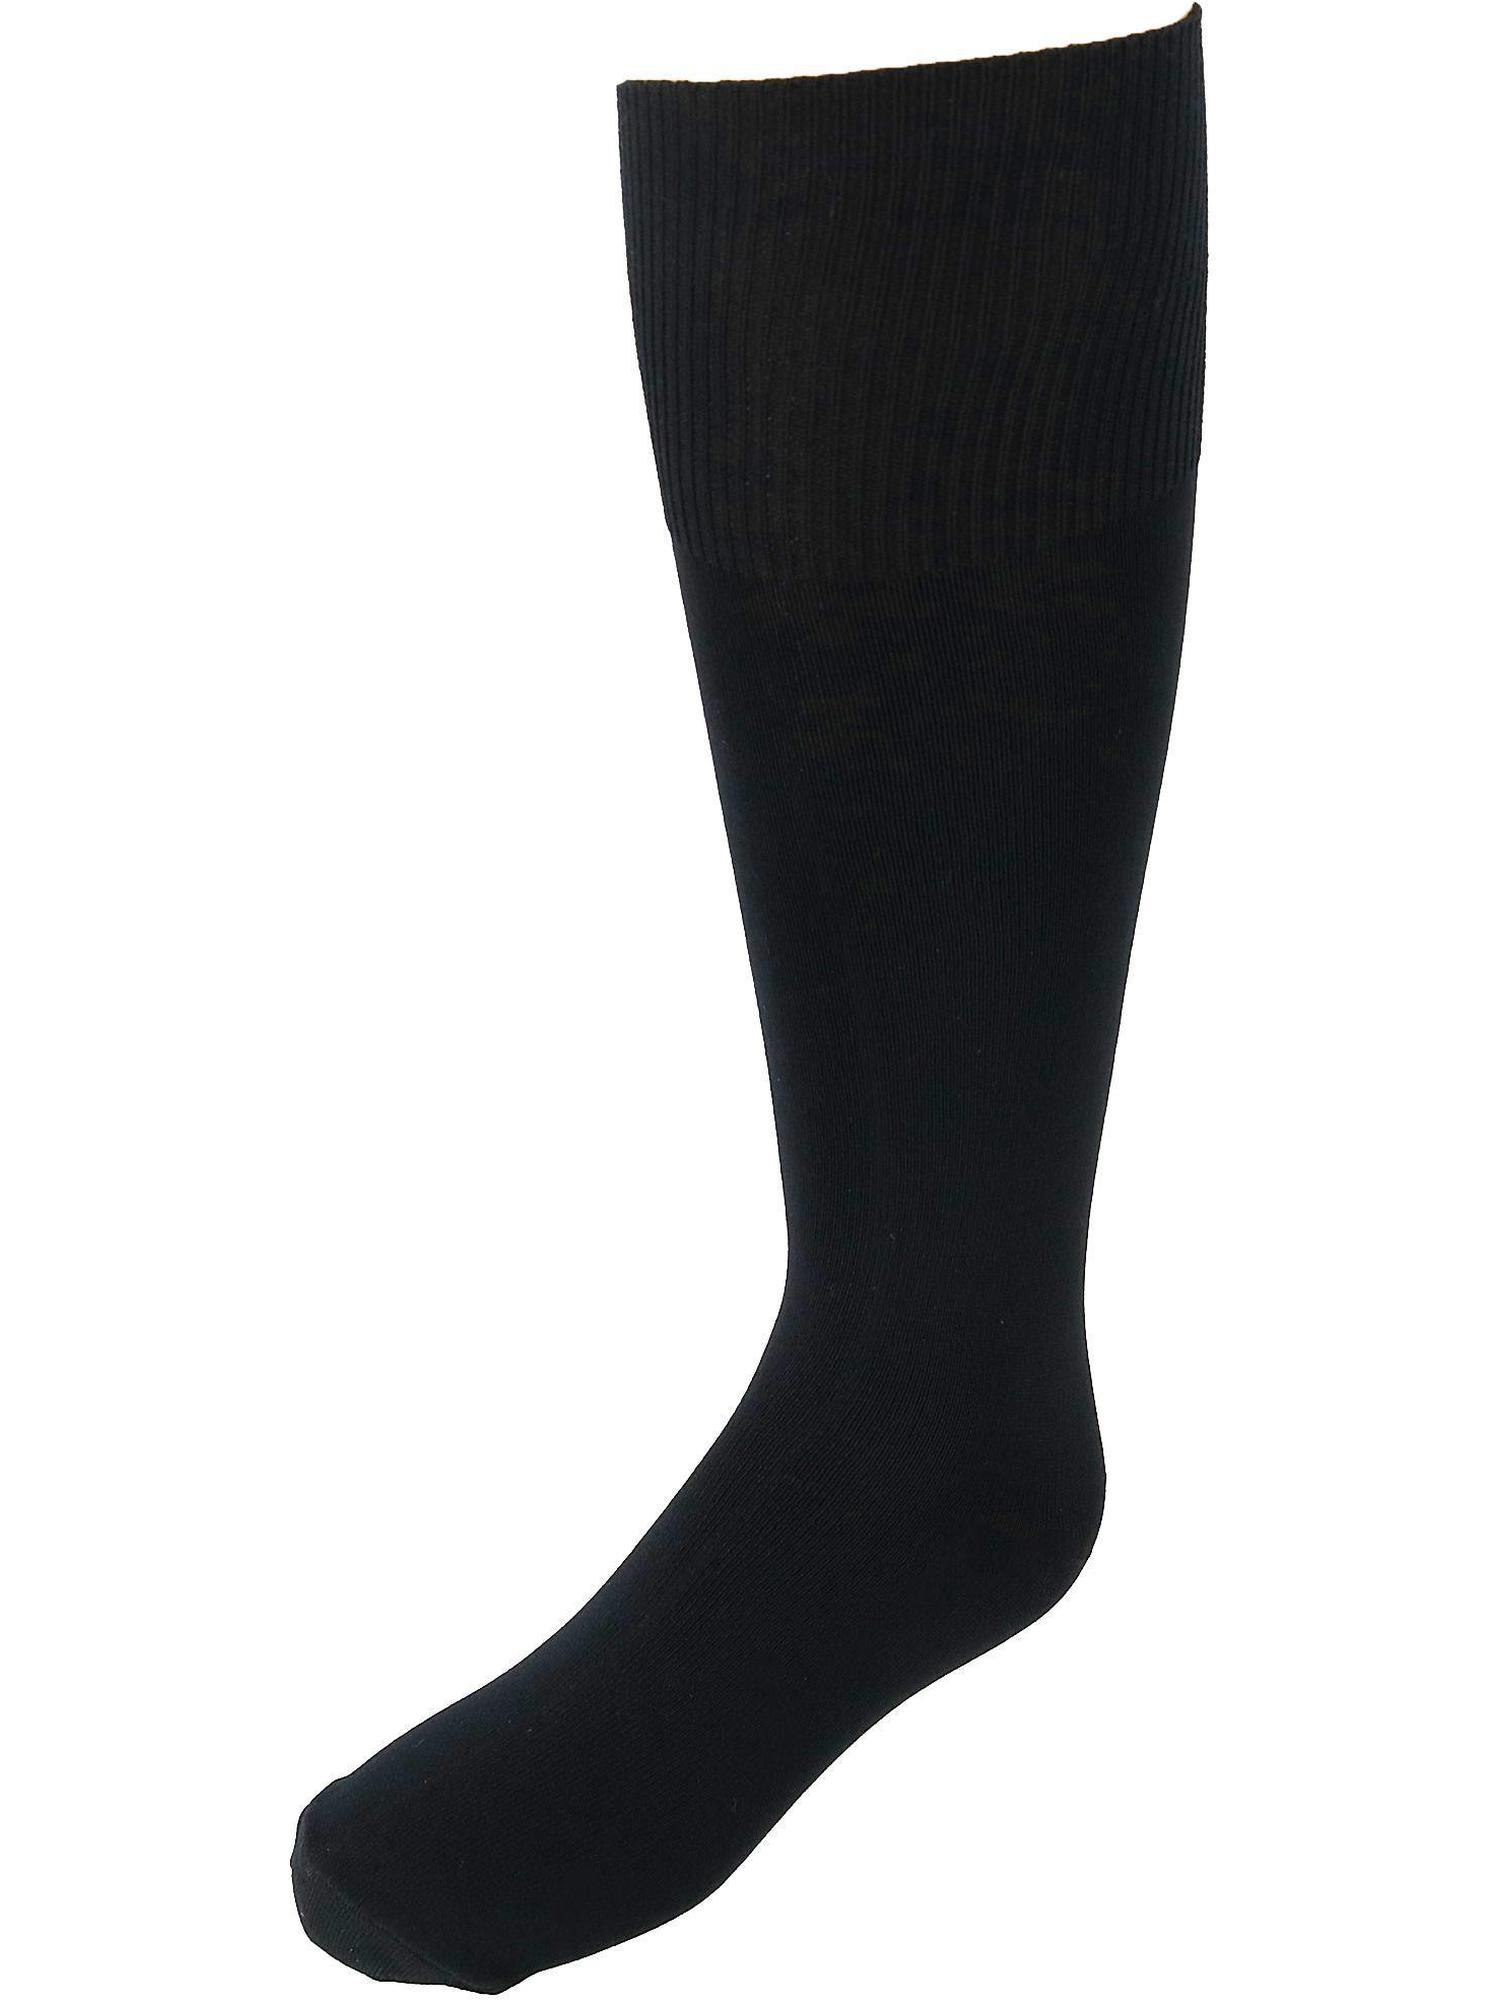 Girl's School Uniform Knee High Socks